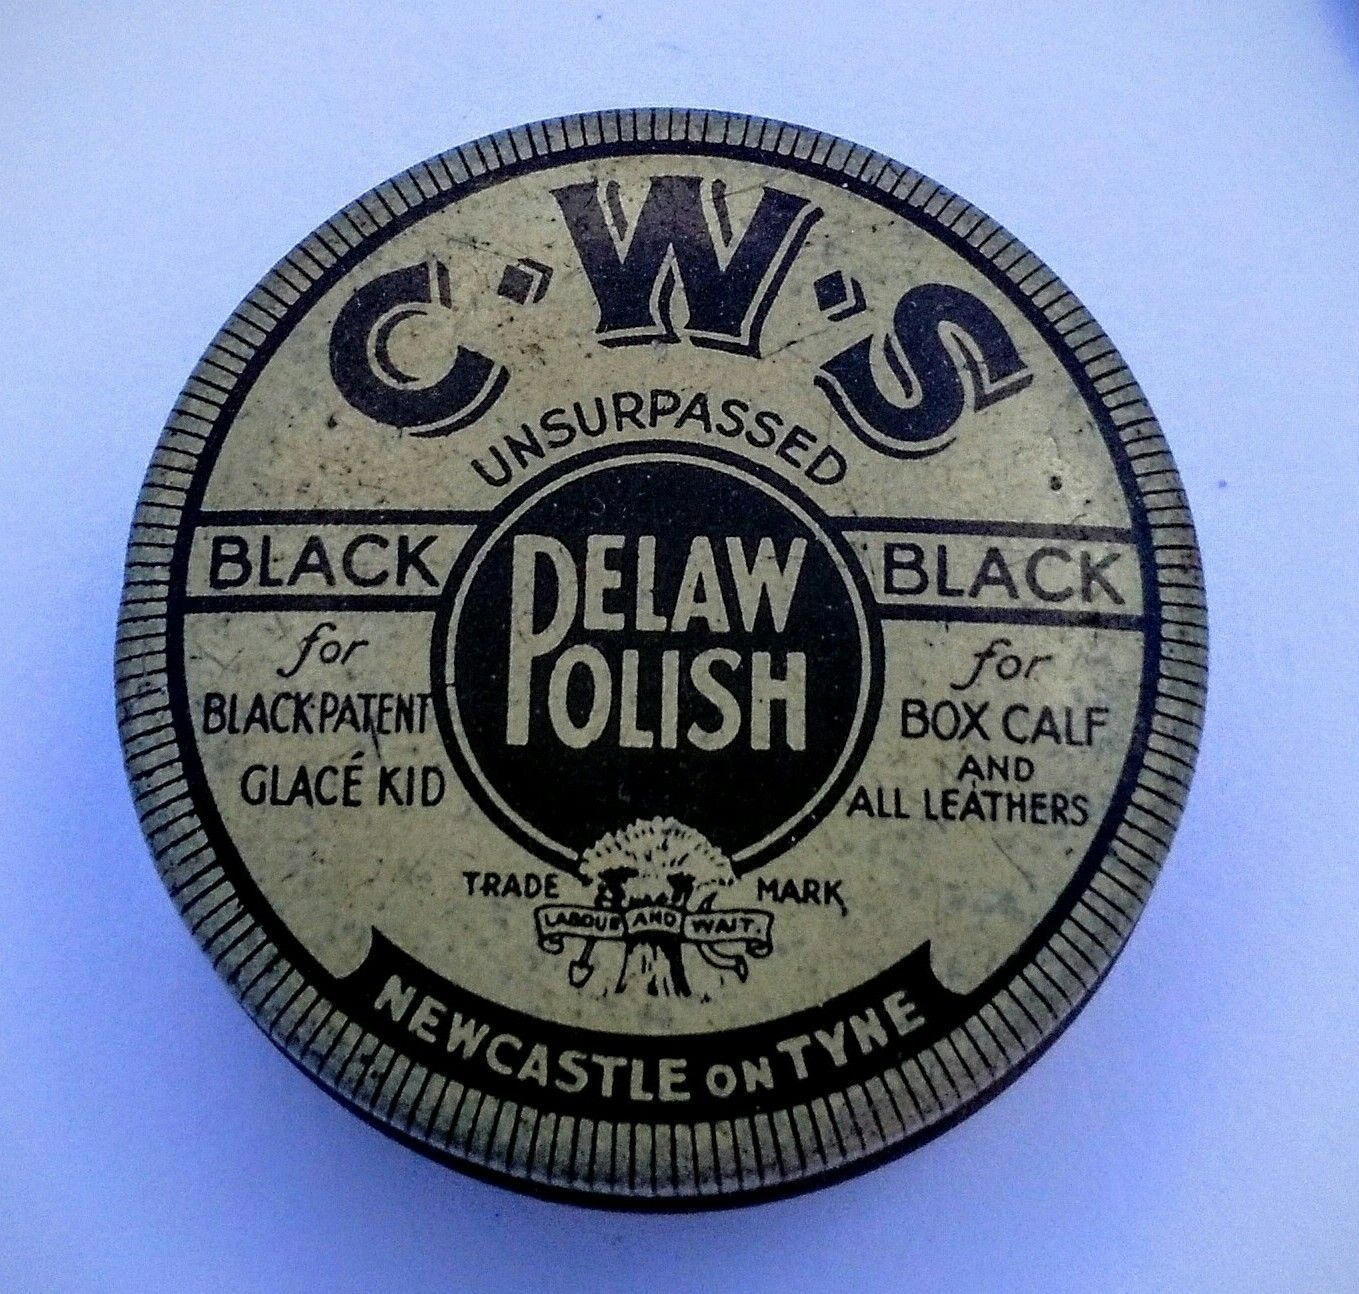 cws pelaw antique. Vintage CWS Pelaw Polish Pencil Sharpner Miniature Advertising Tin | EBay Cws Antique -